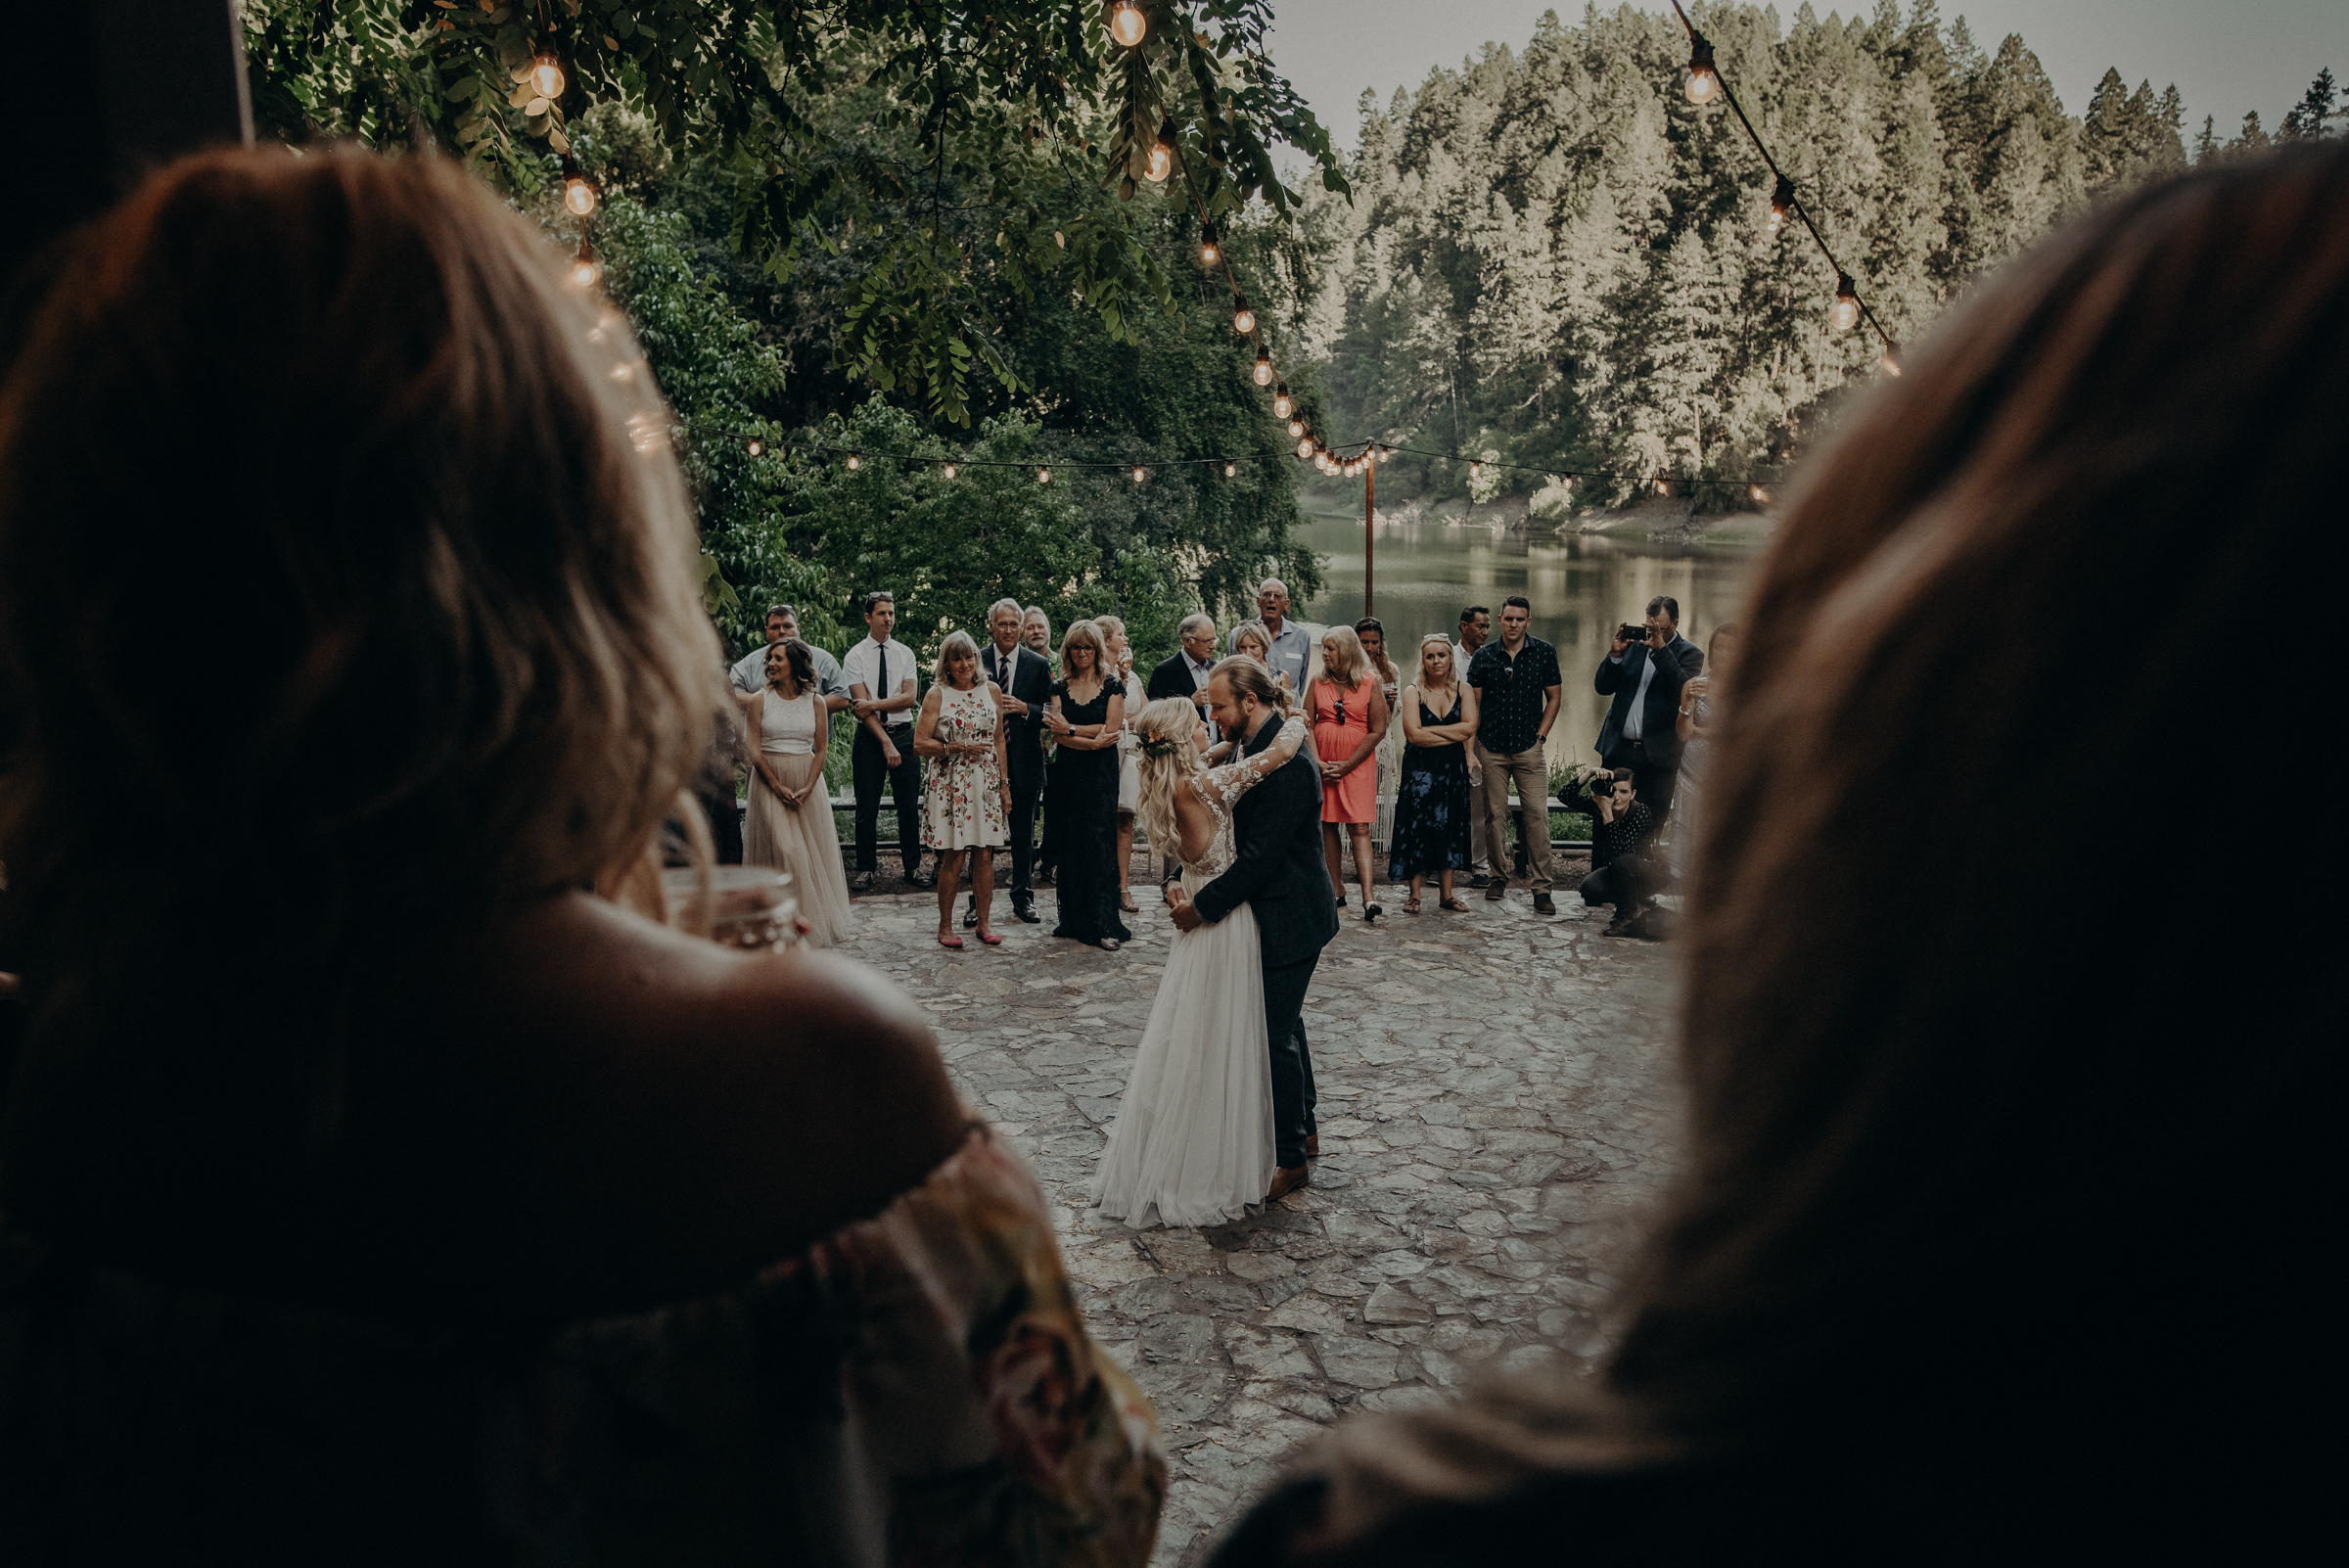 IsaiahAndTaylor.com - California Destination Elopement, Lake Leonard Reserve Wedding, Ukiah-175.jpg